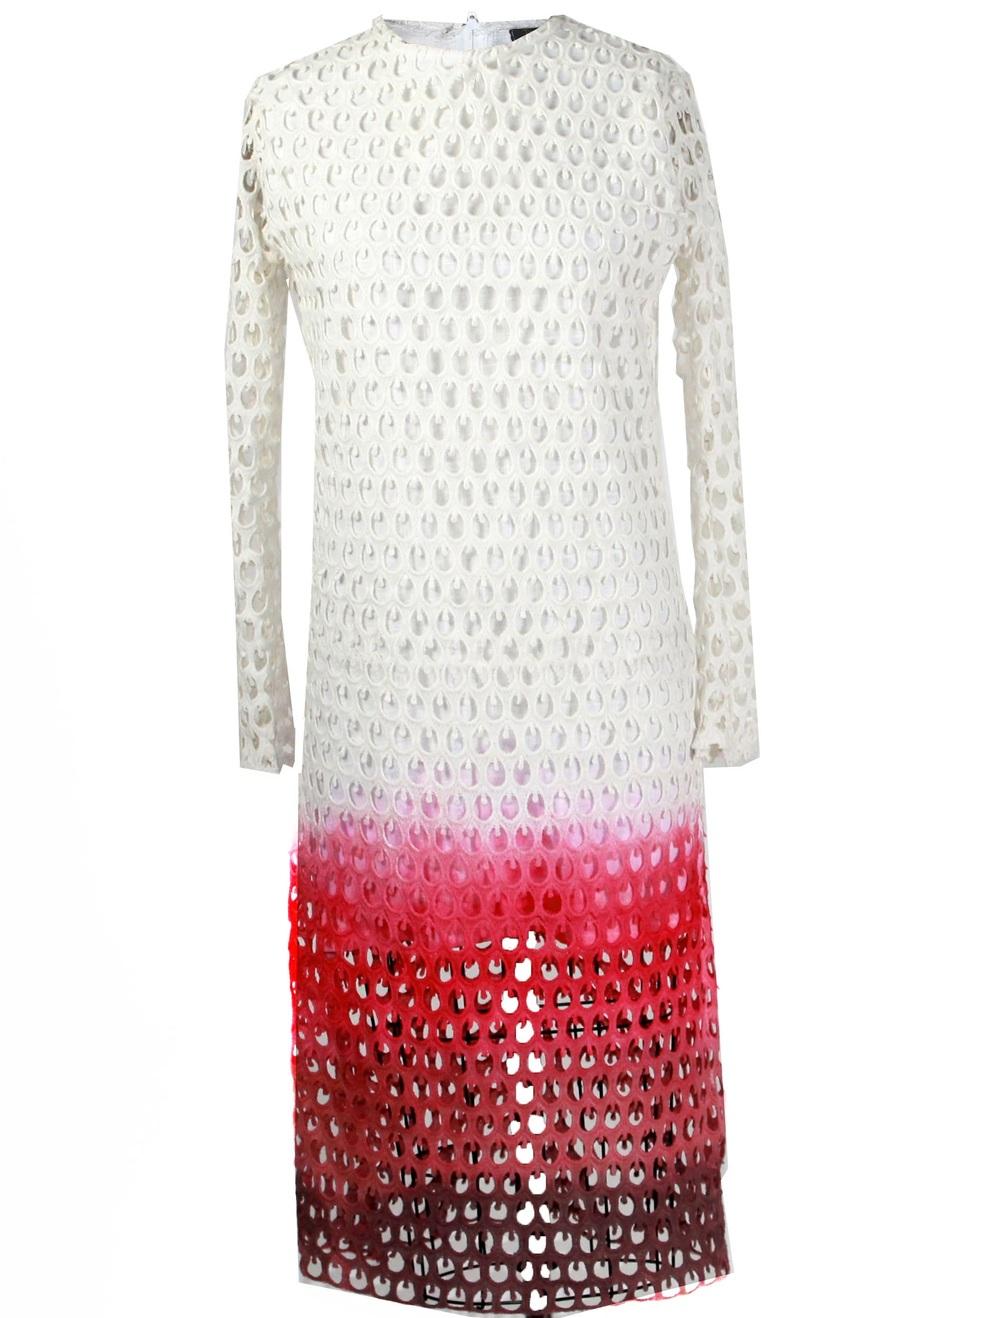 Lace Ombre Dress 1.jpg